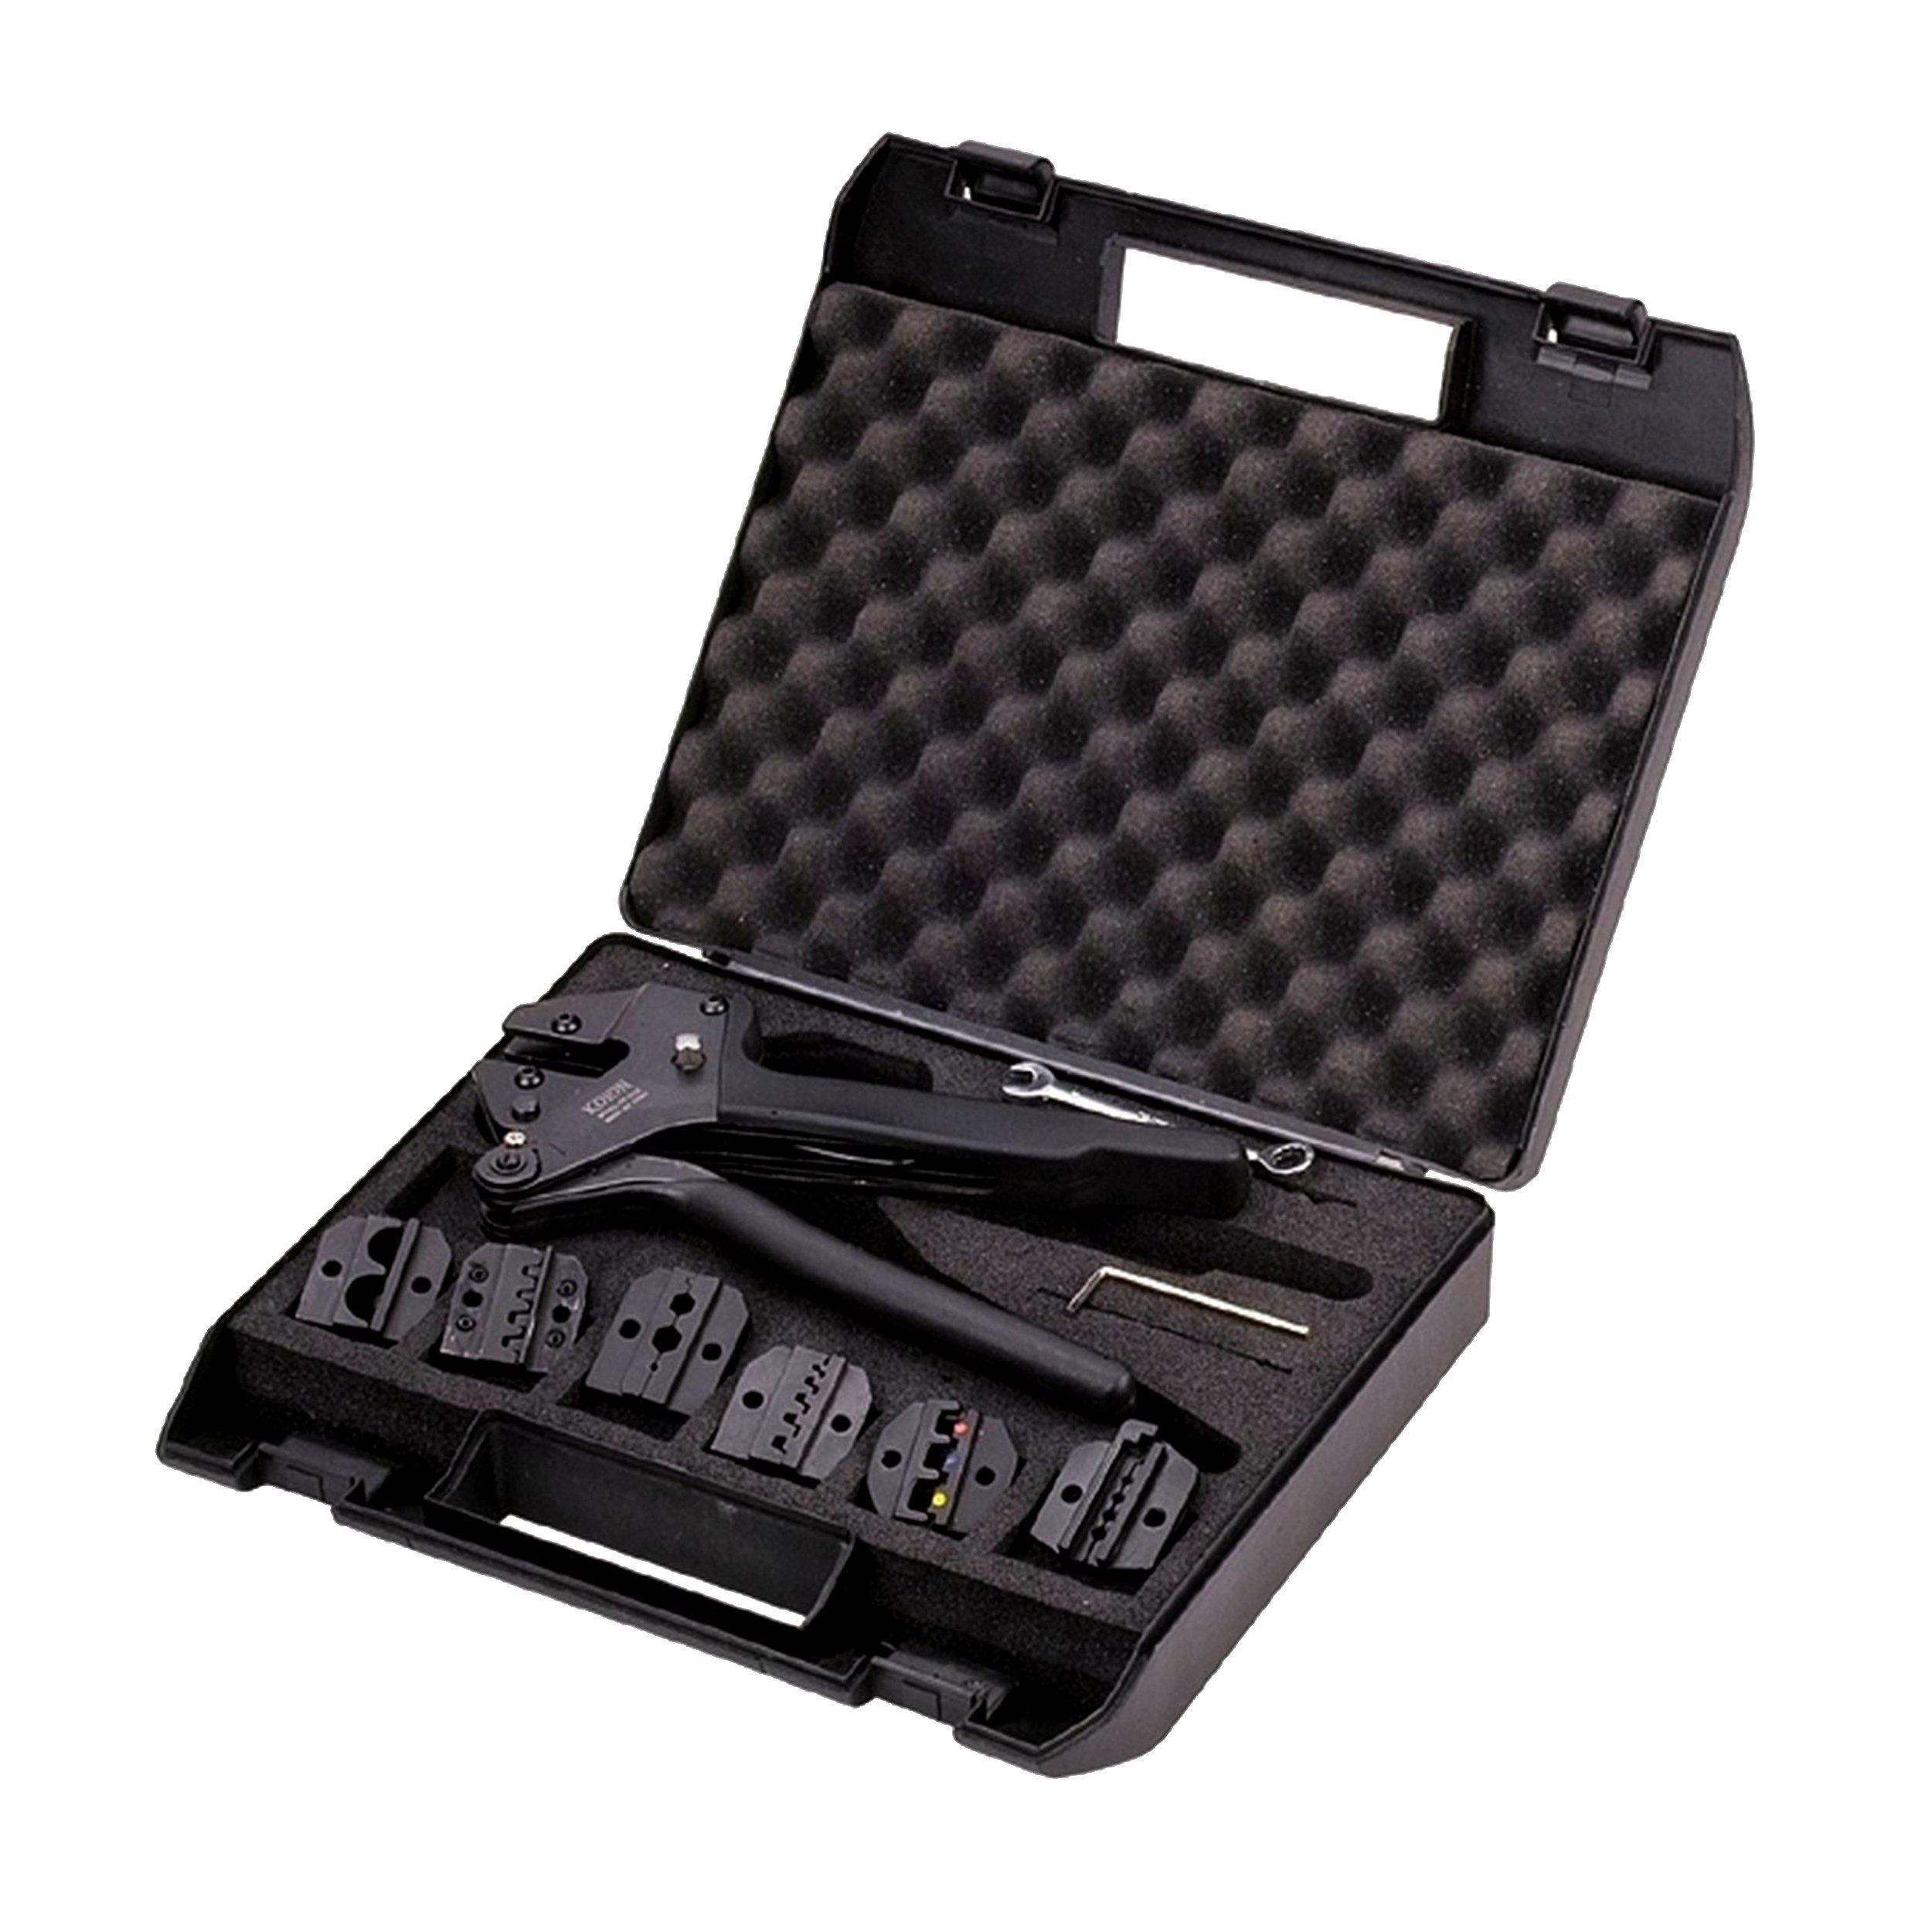 Homevision Technology HV2528 Professional Crimping Tool kit, Black